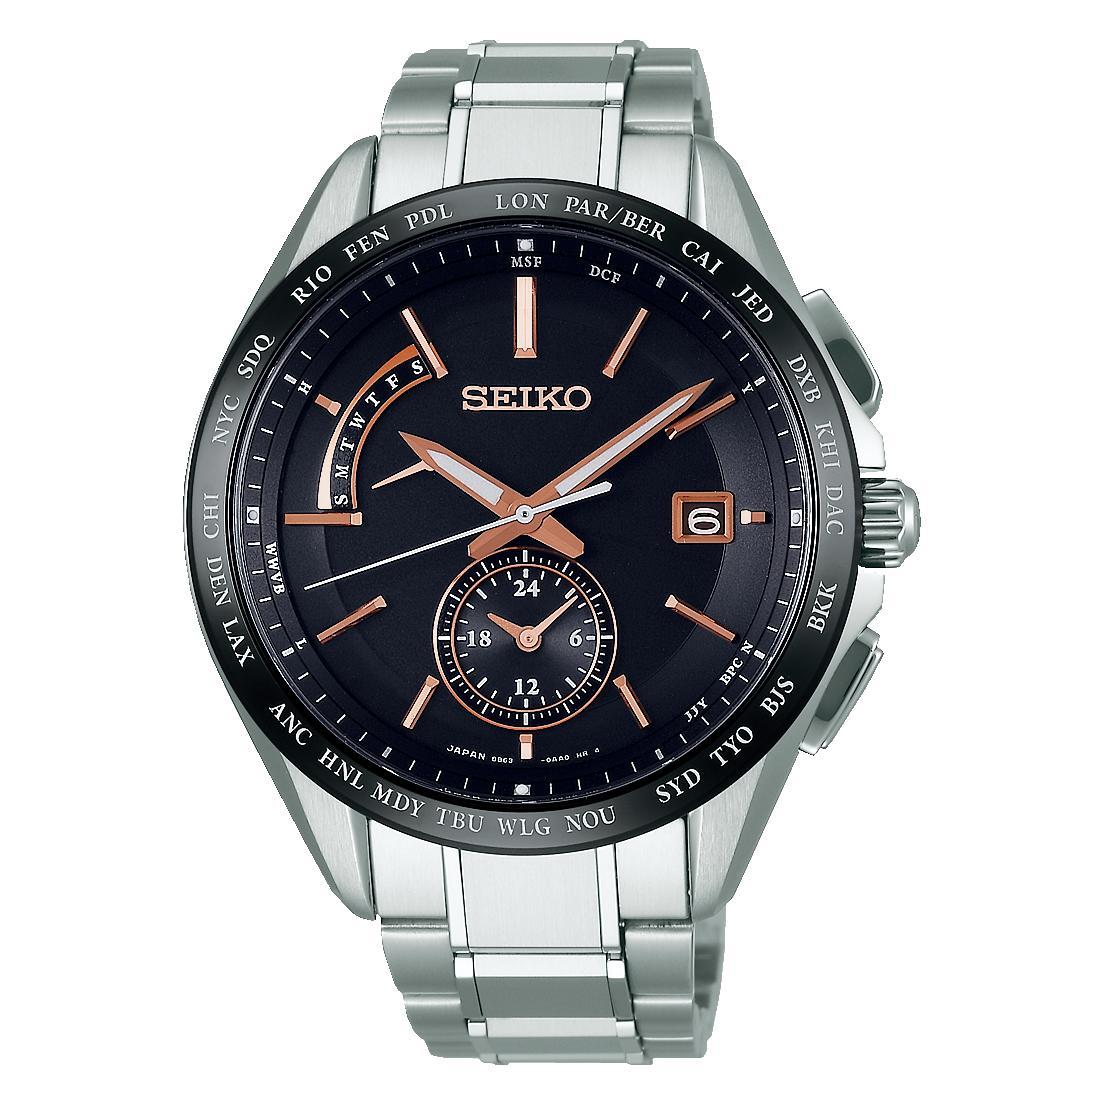 SEIKO セイコー BRIGHTZ ブライツSAGA243 ソーラー電波時計【正規販売店】